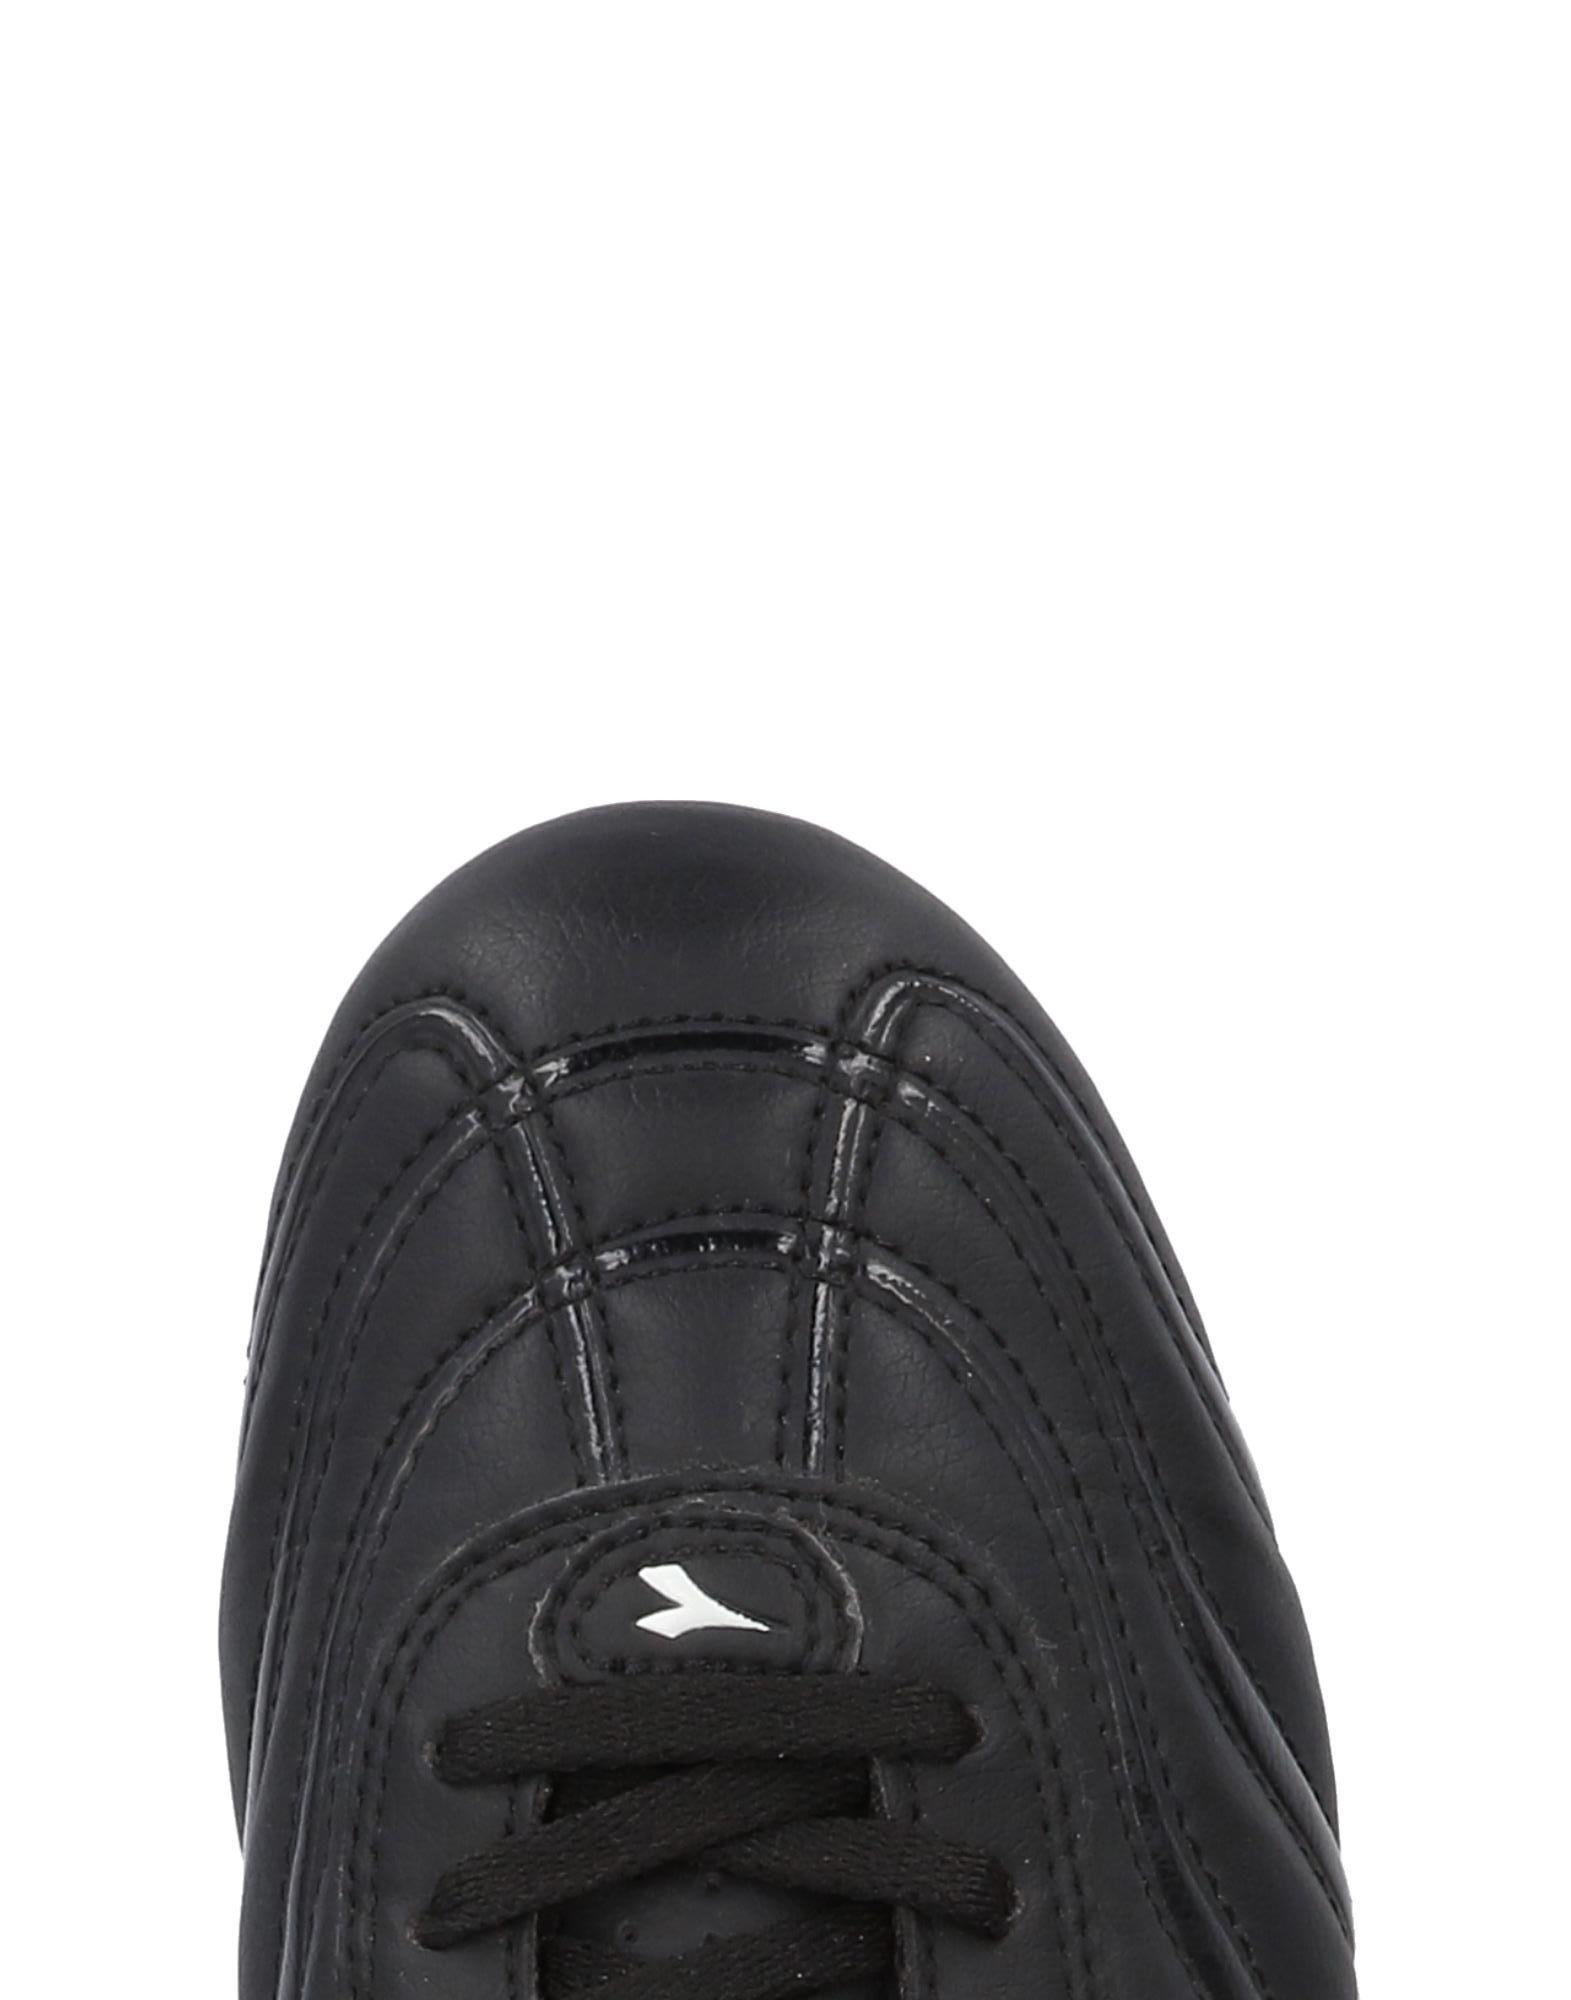 Diadora Sneakers - Men Diadora Sneakers online 11466910AG on  Australia - 11466910AG online 524b8c